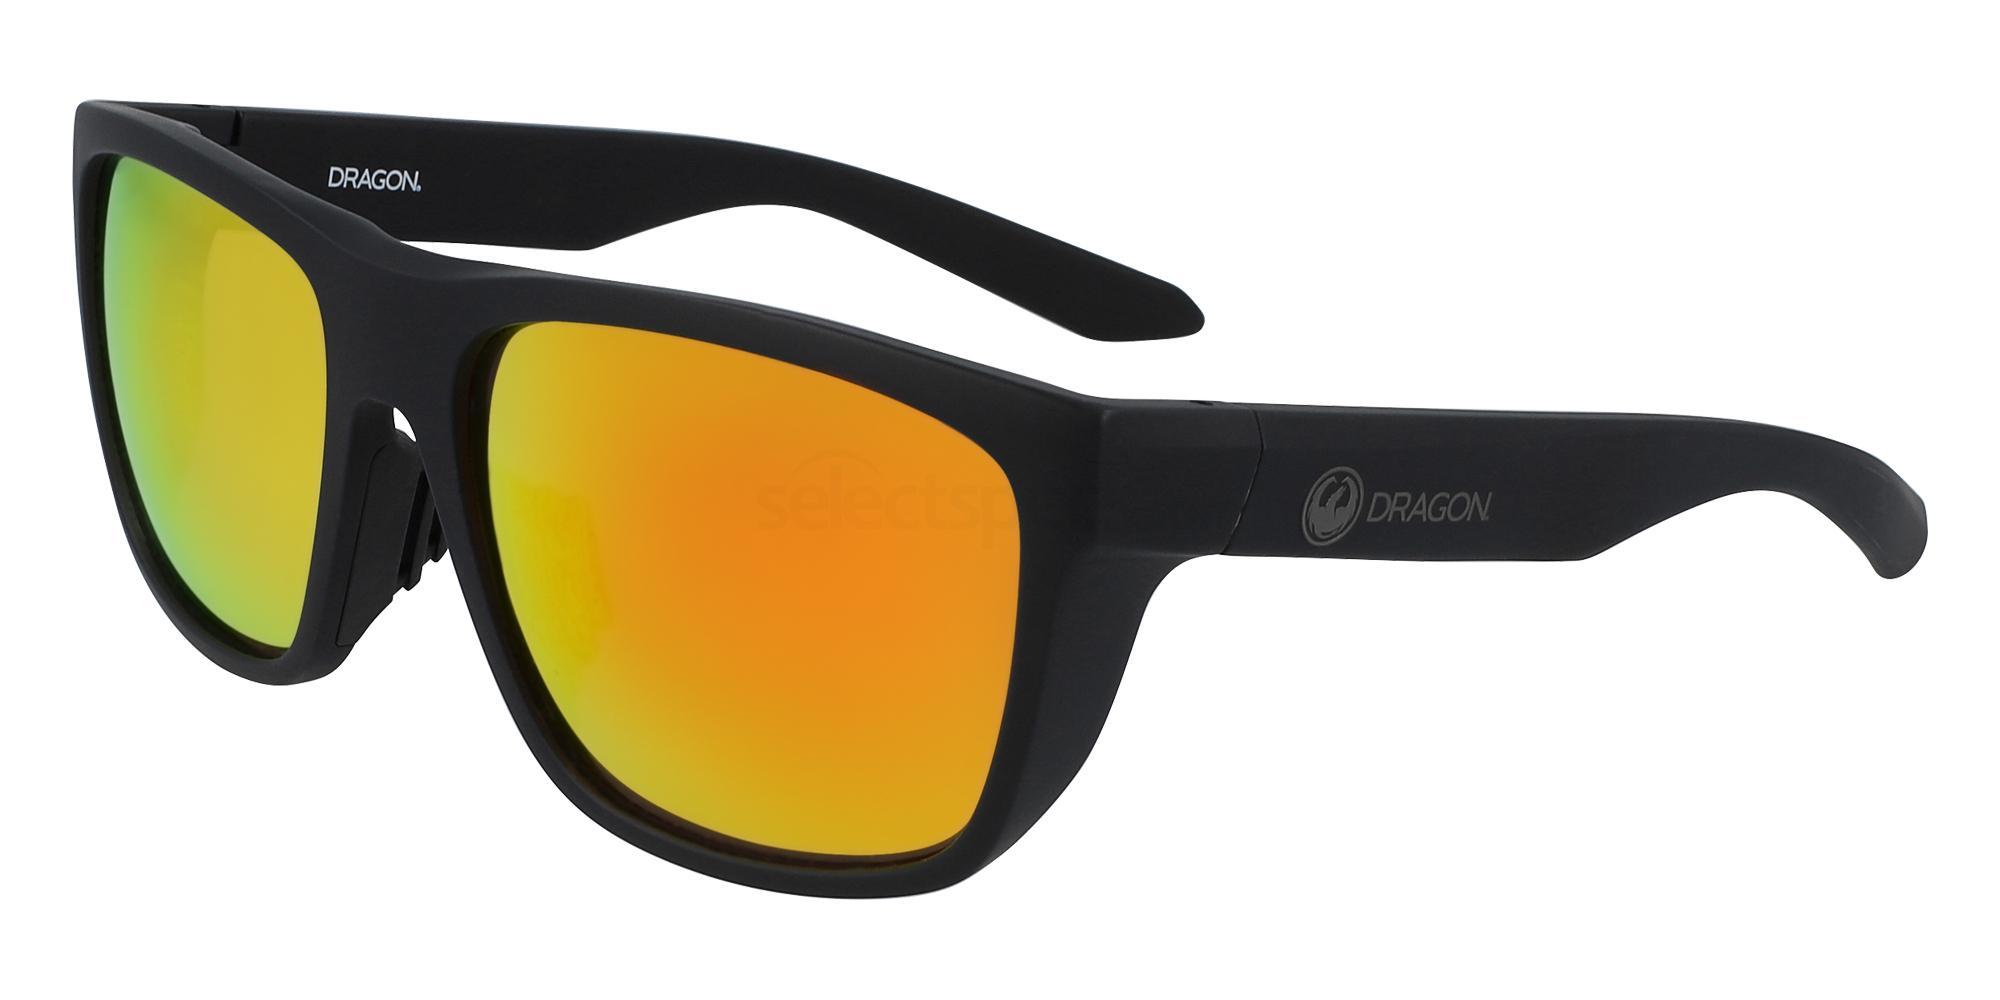 022 DR AERIAL LL ION Sunglasses, Dragon